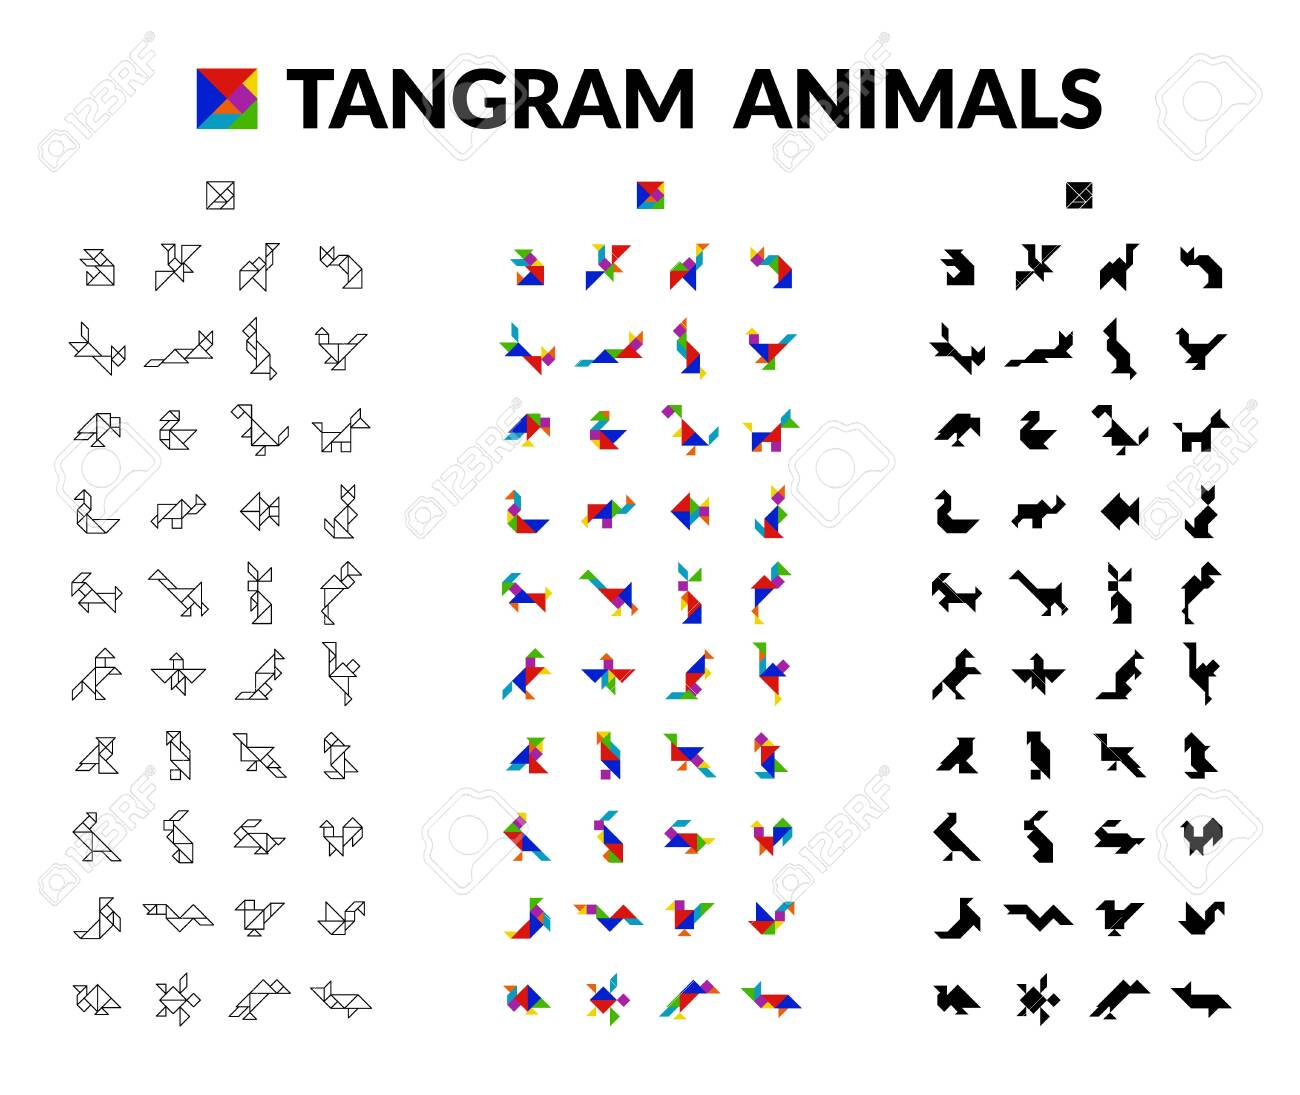 People Silhouette Tangram Card #6 | Tangram, Exercise for kids, Cards